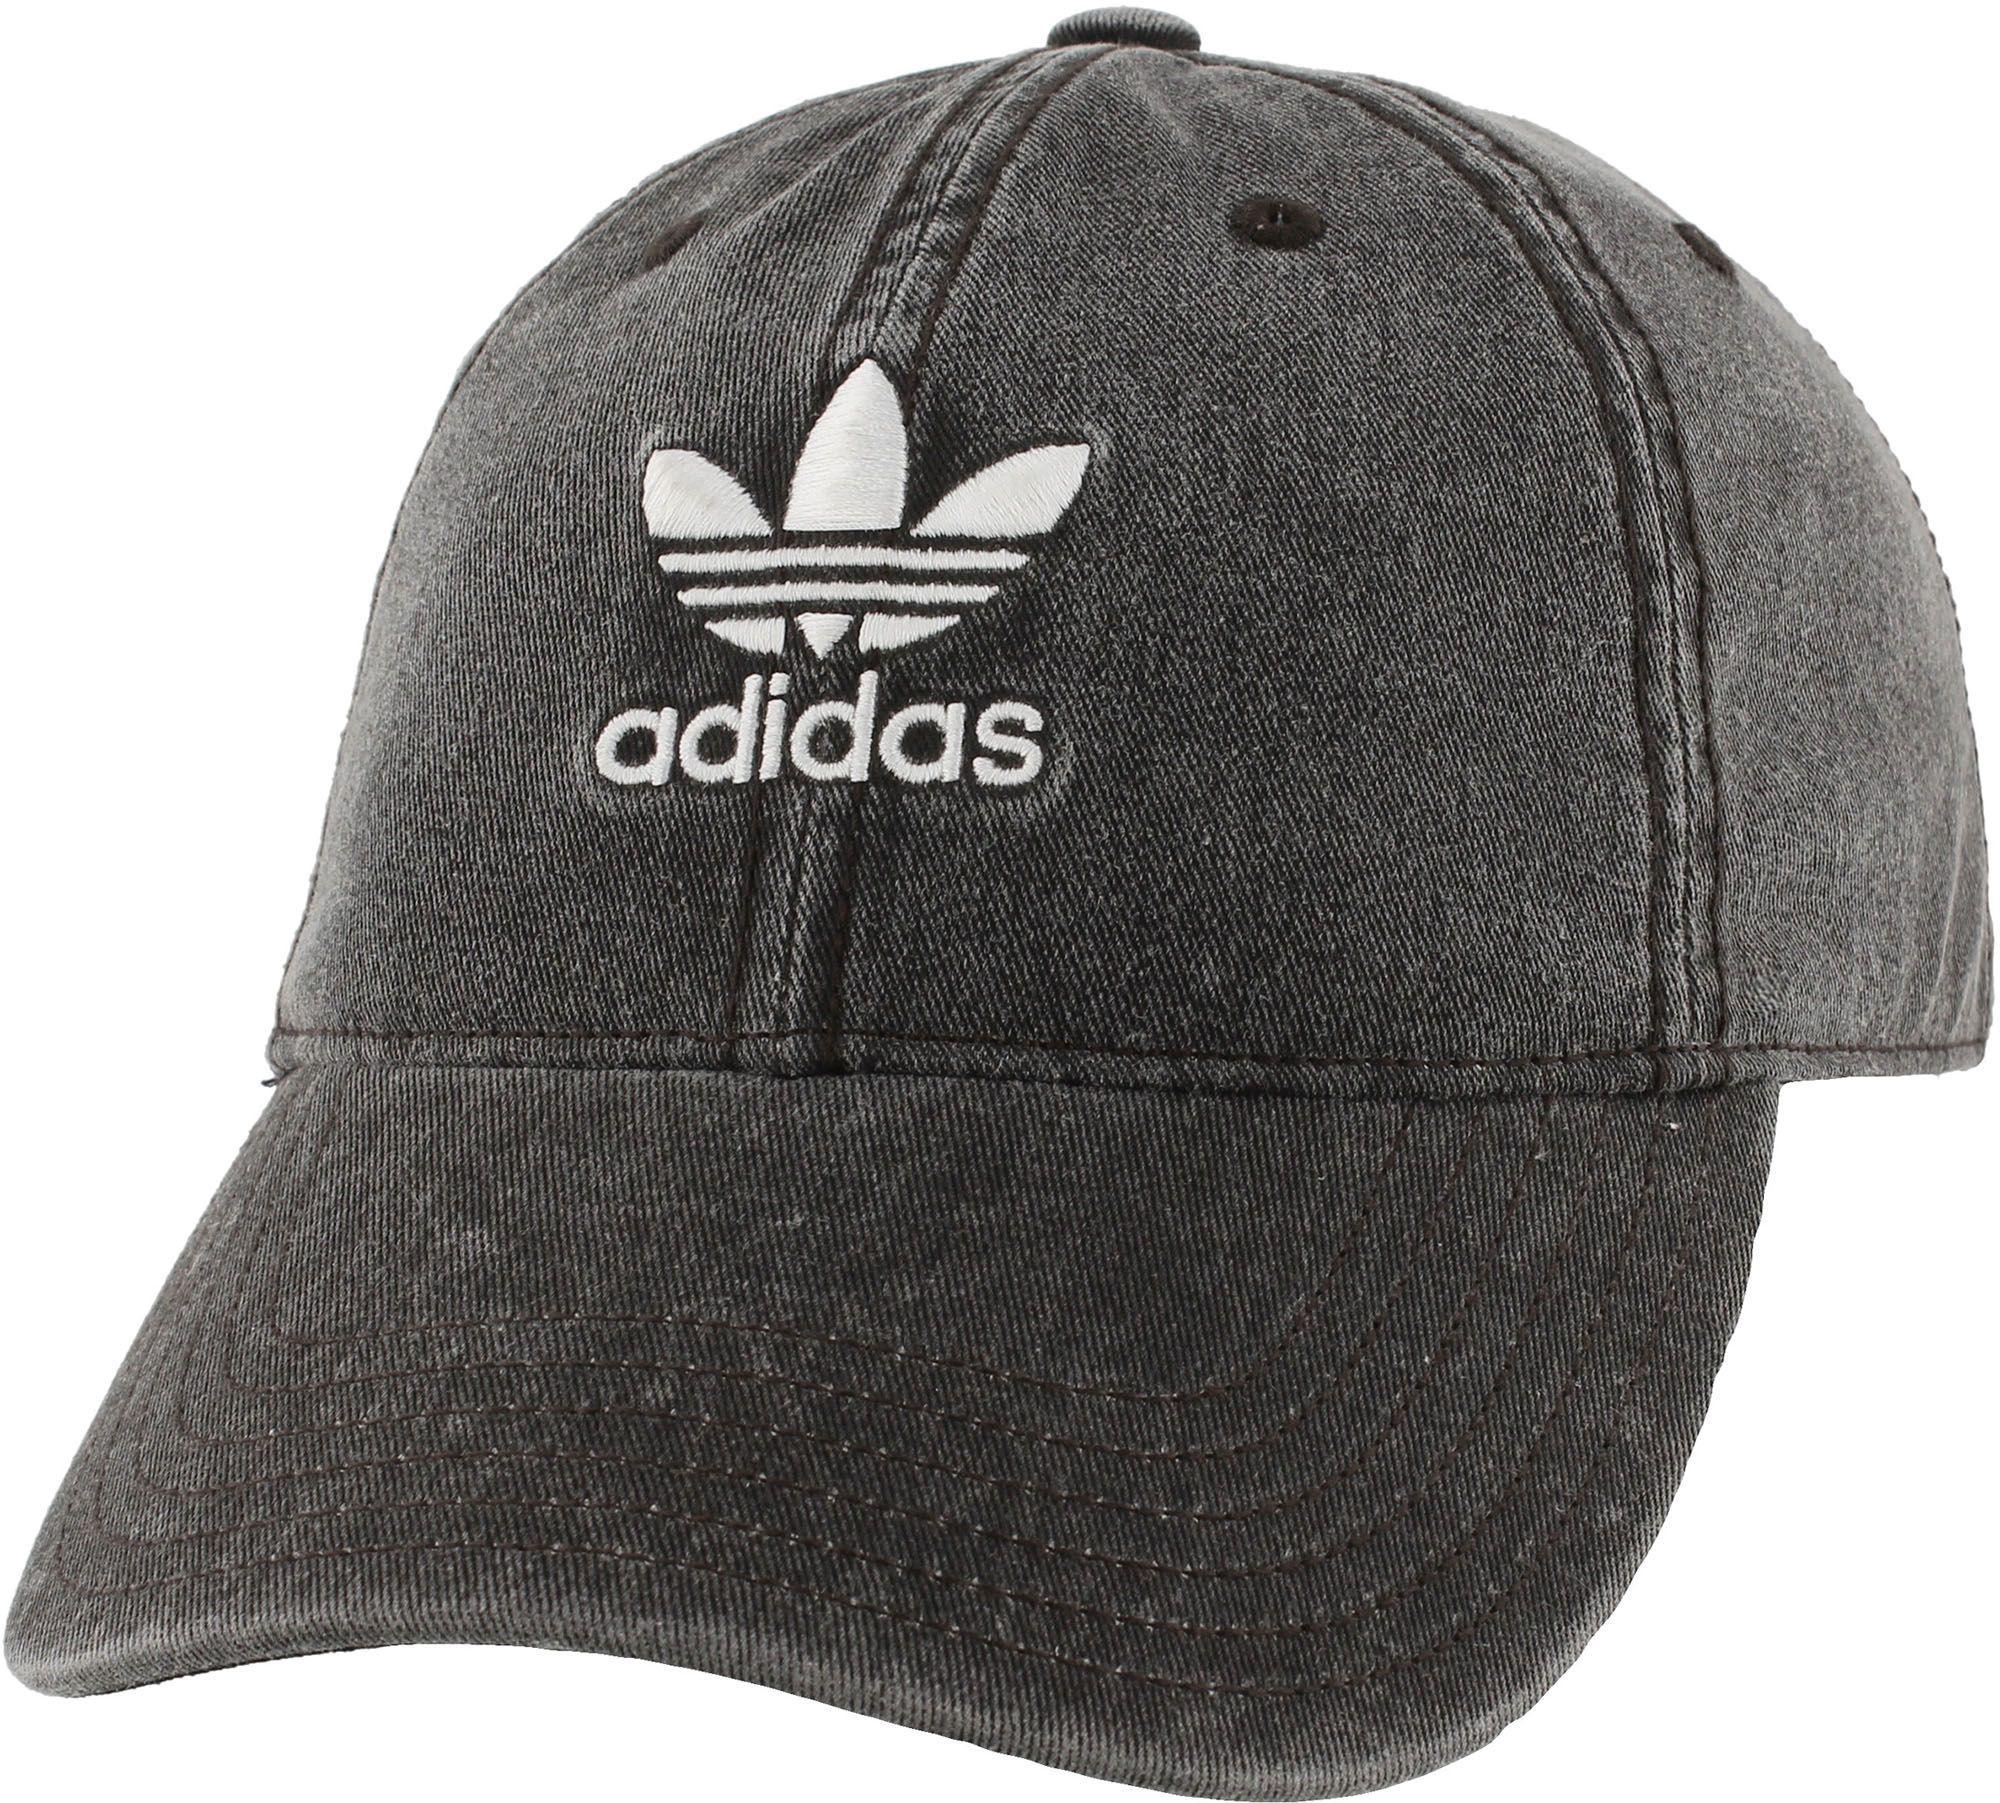 f641b45e7285a Adidas - Black Originals Relaxed Strapback Hat - Lyst. View fullscreen